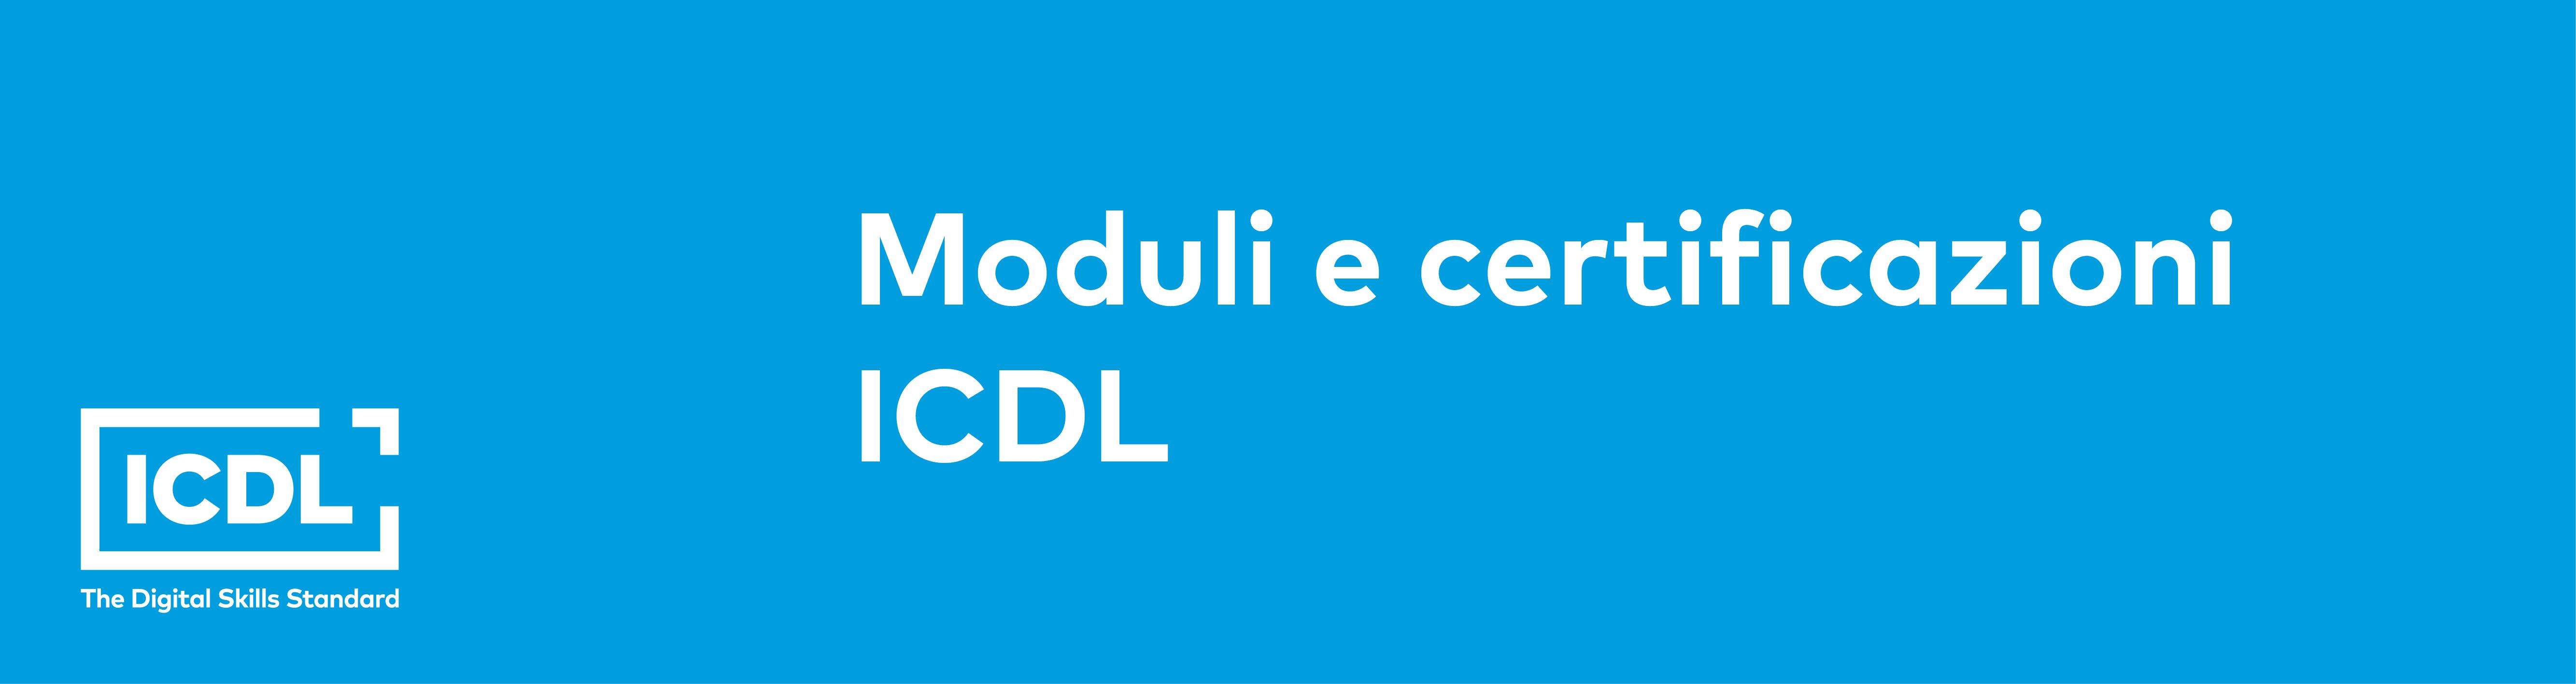 Certificazioni ICDL